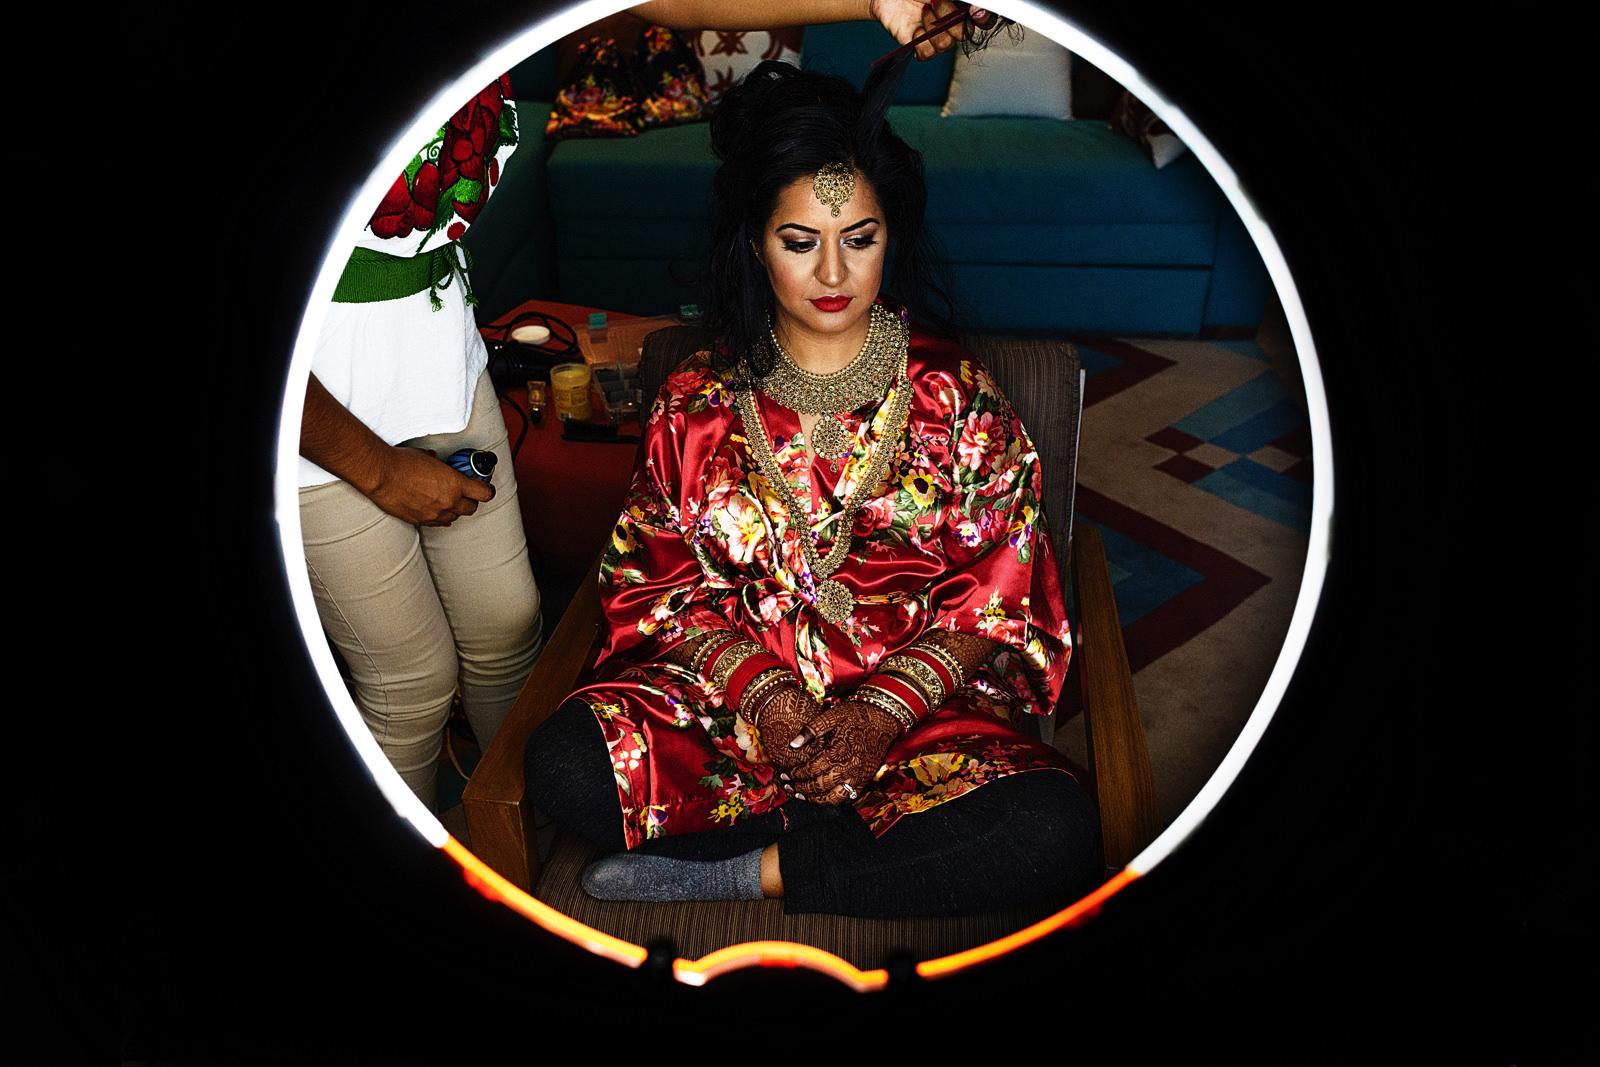 Hindu bride getting her hair done seen through a ring light